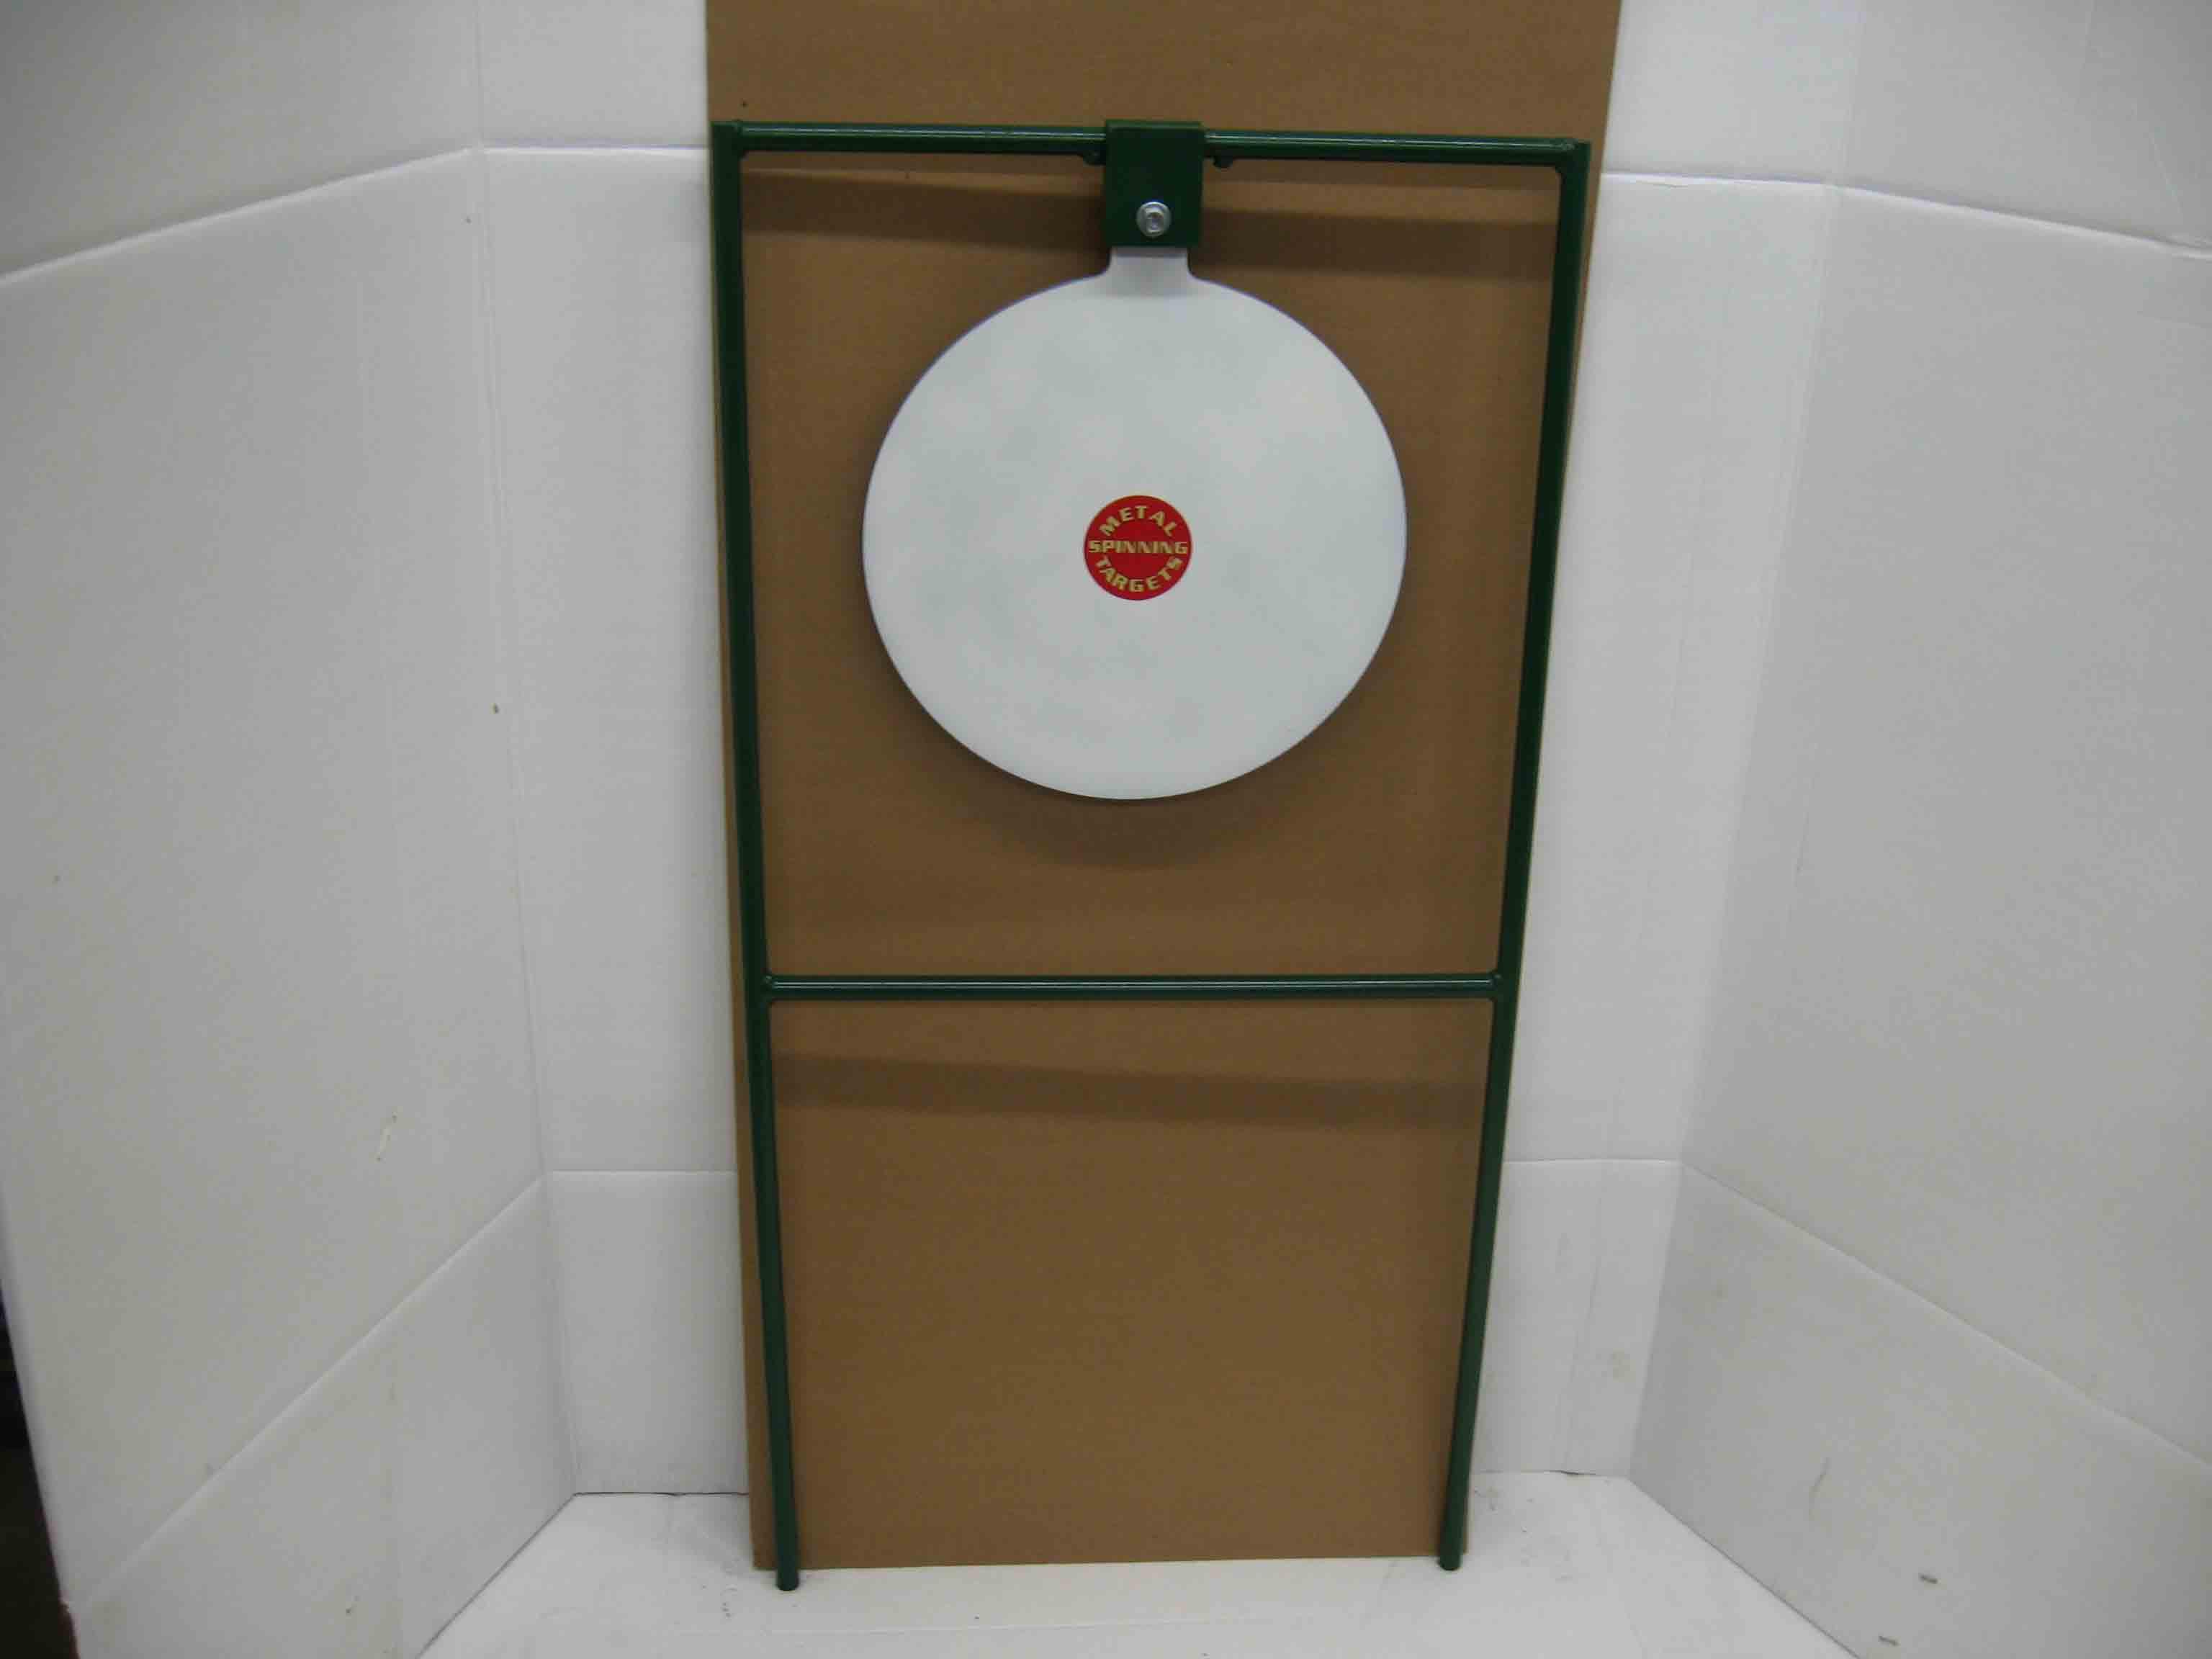 15-inch circle gong swinger steel shooting targets